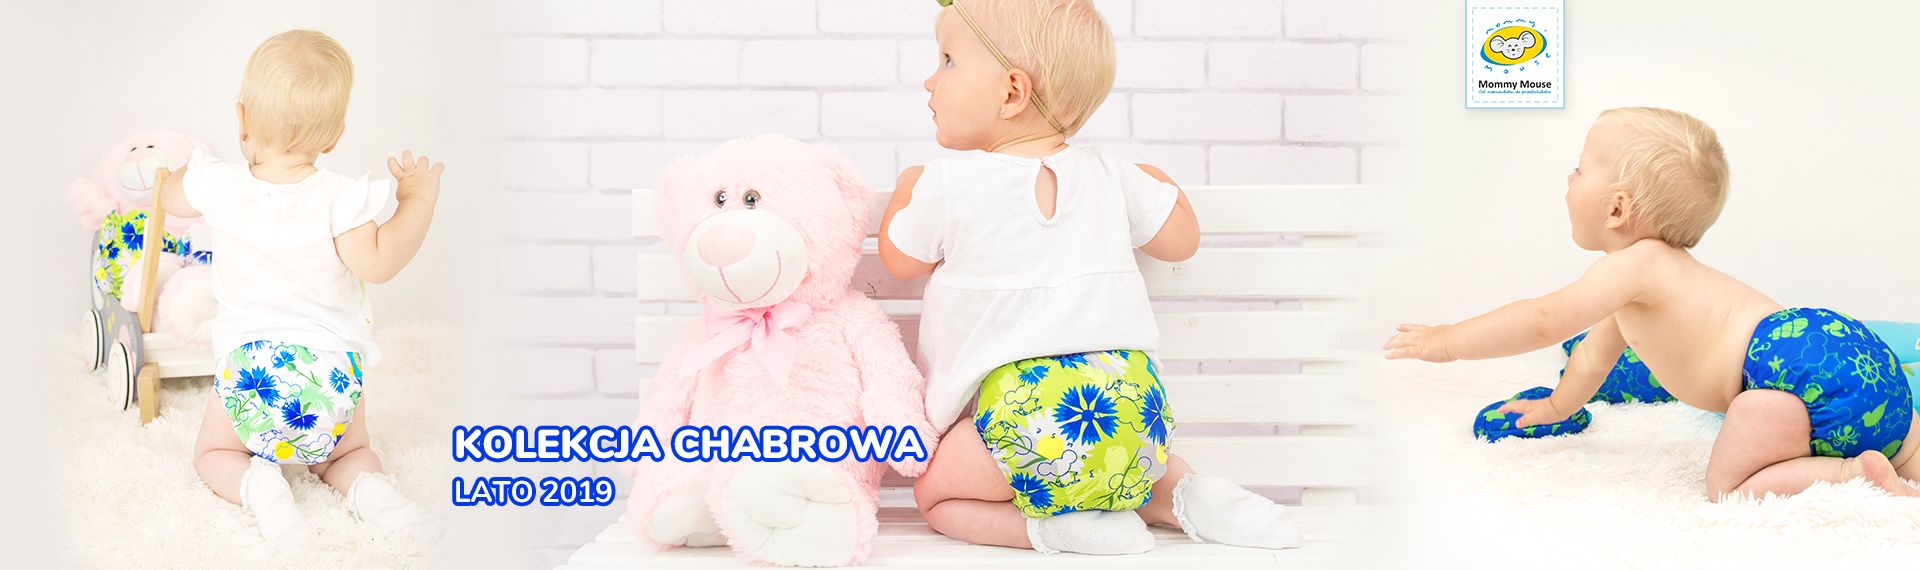 MM-Kolekcja-chabrowa-lato-2019-1920x570px-slider